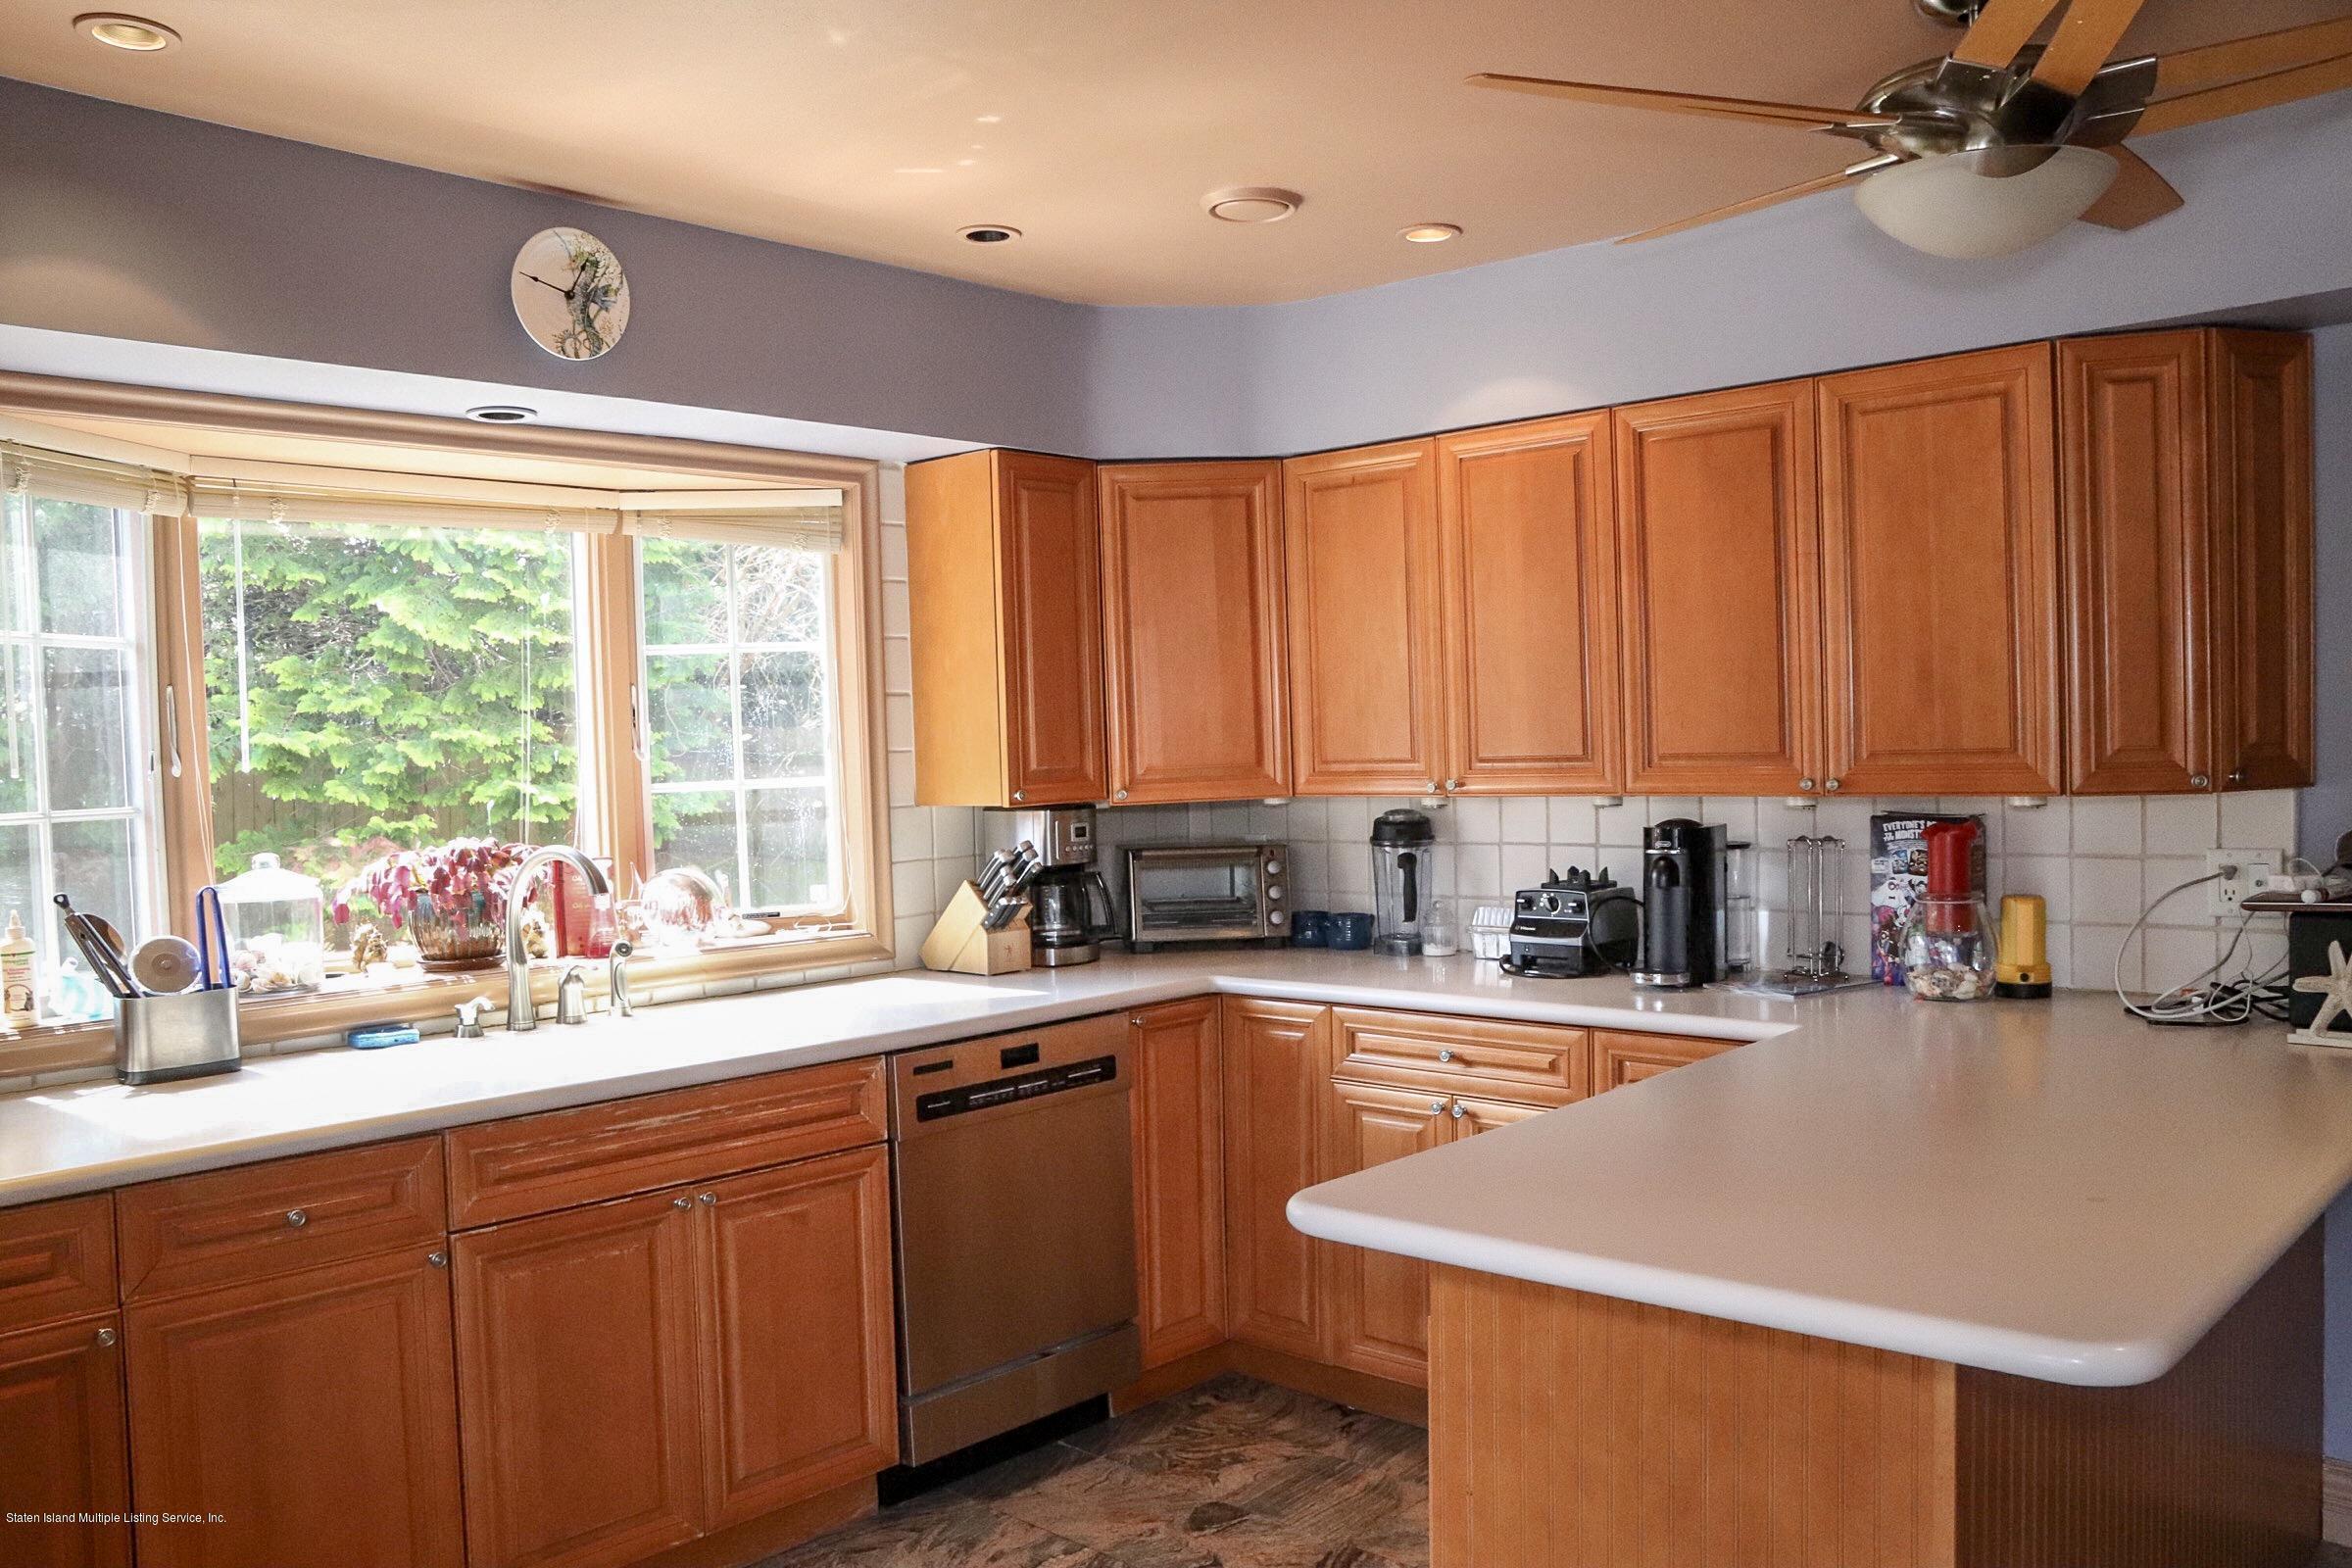 Single Family - Detached 15 Butterworth Avenue  Staten Island, NY 10301, MLS-1127612-3